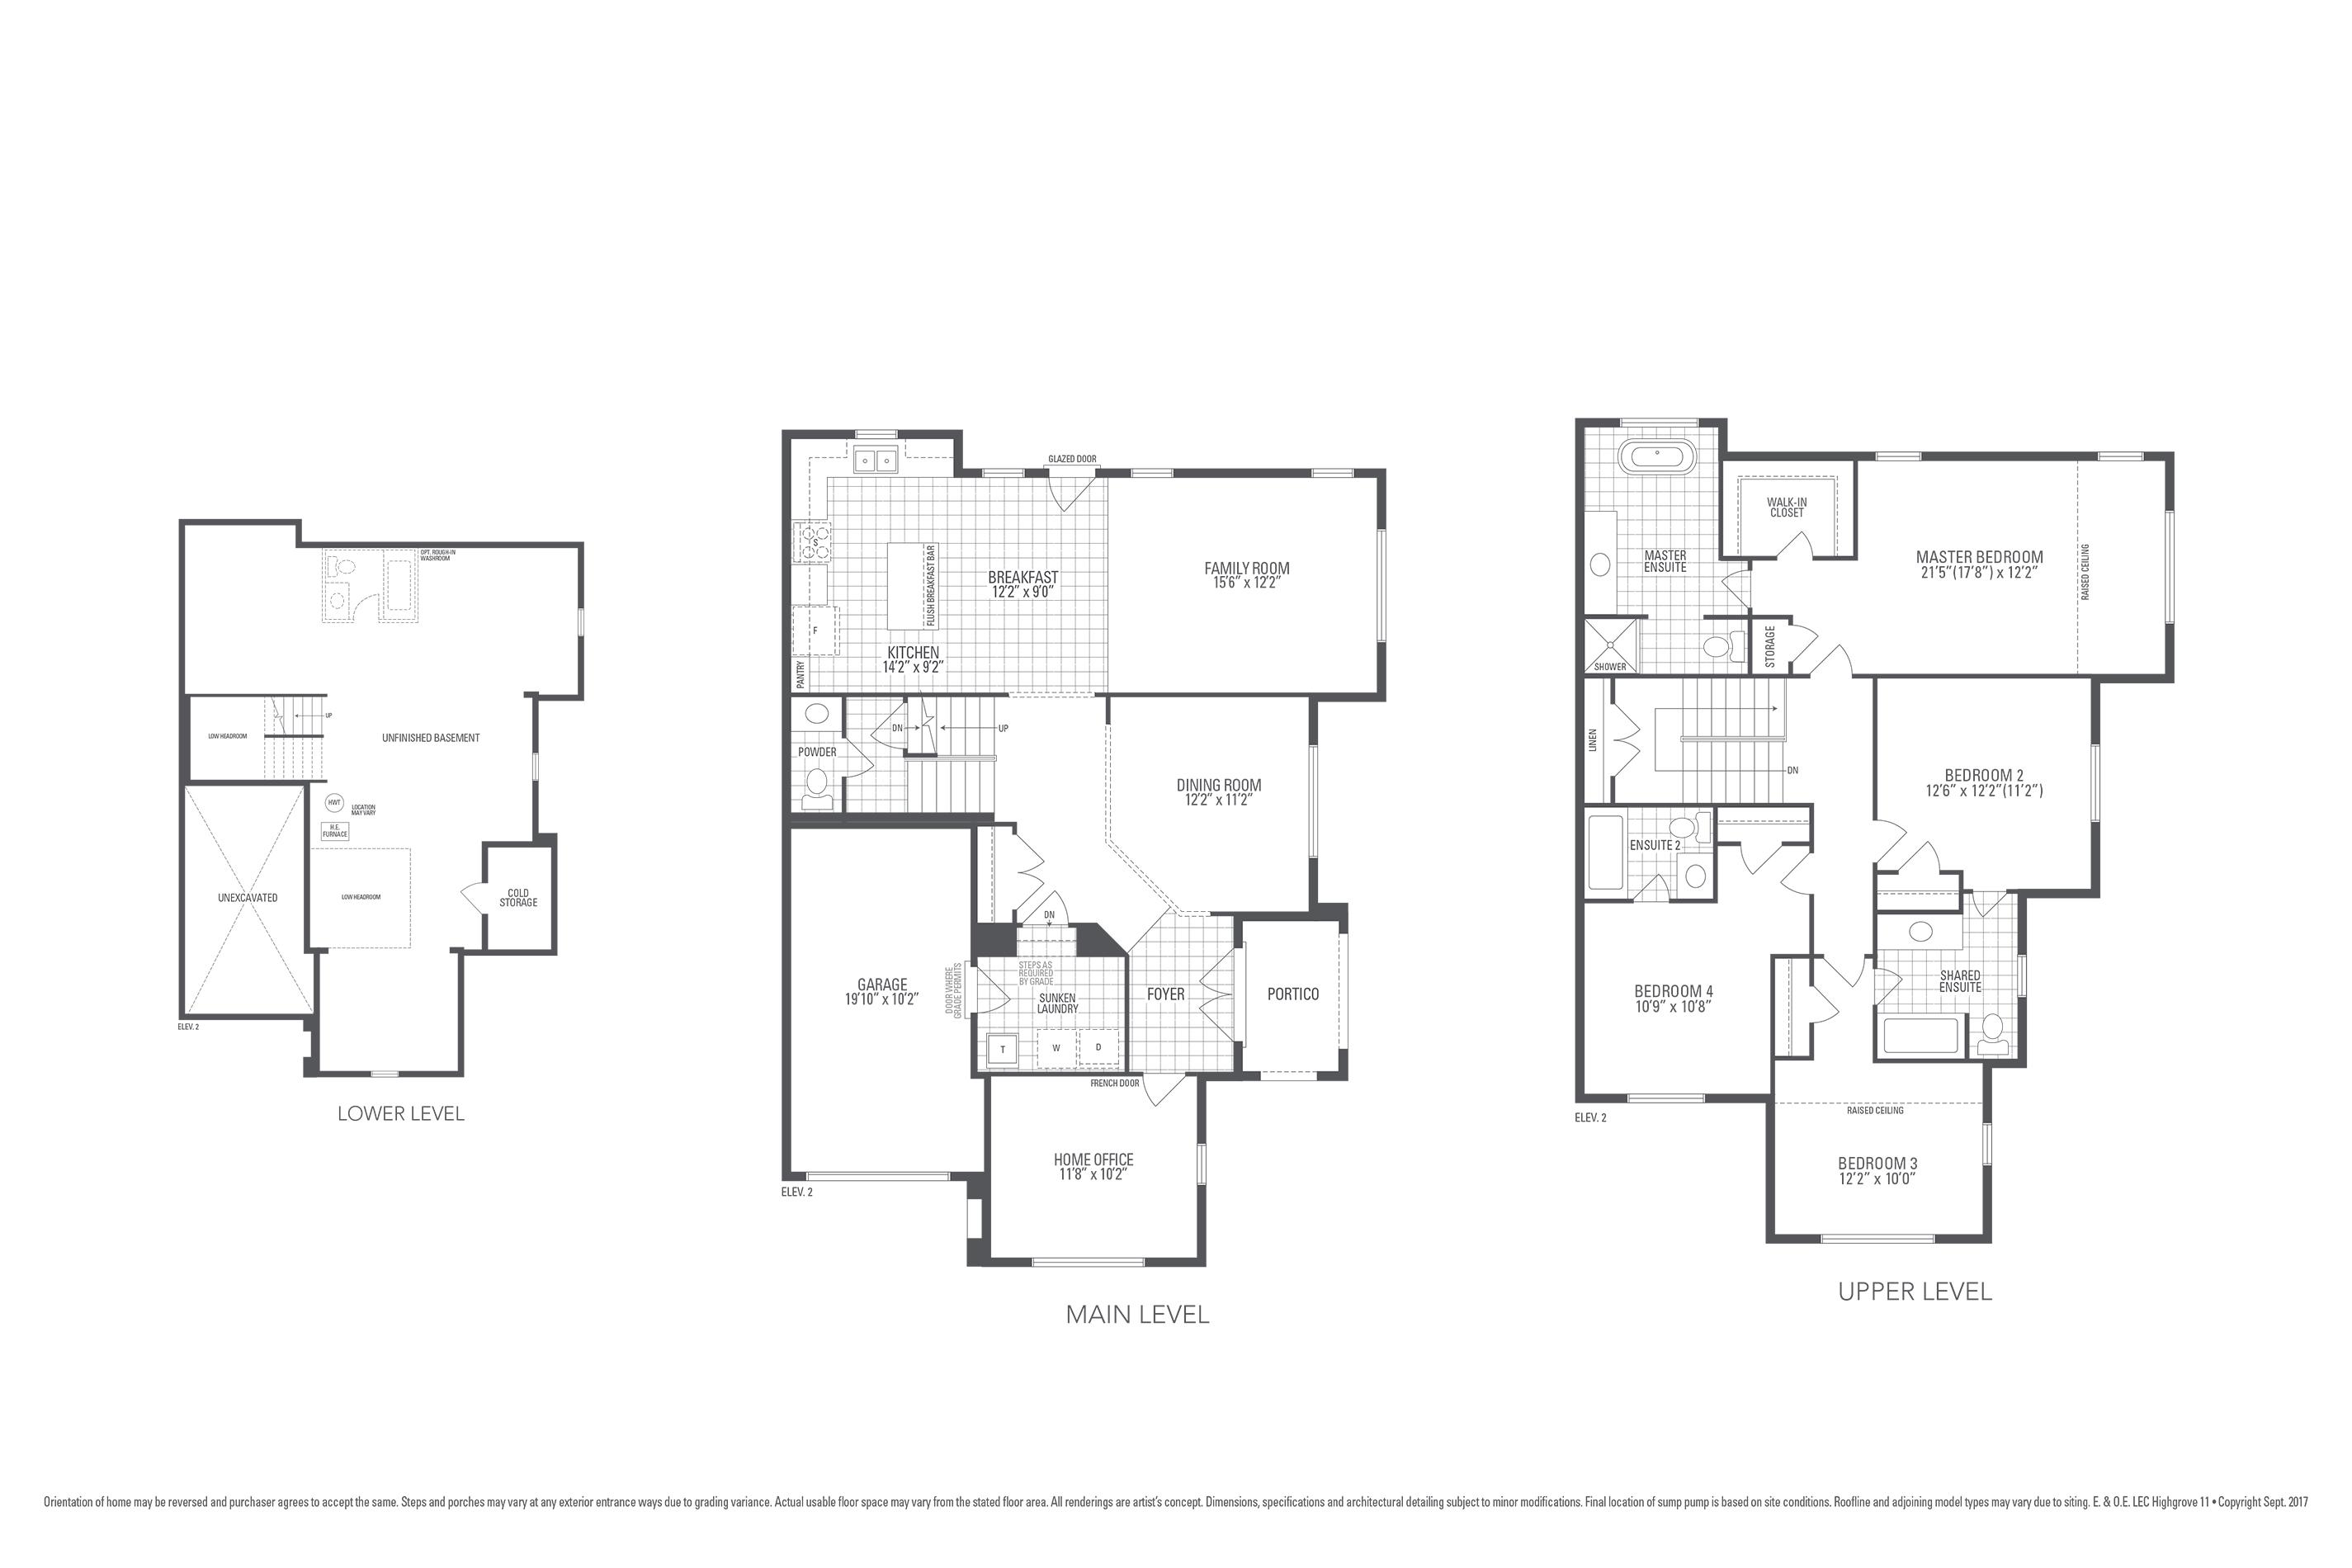 Highgrove 11 Floorplan